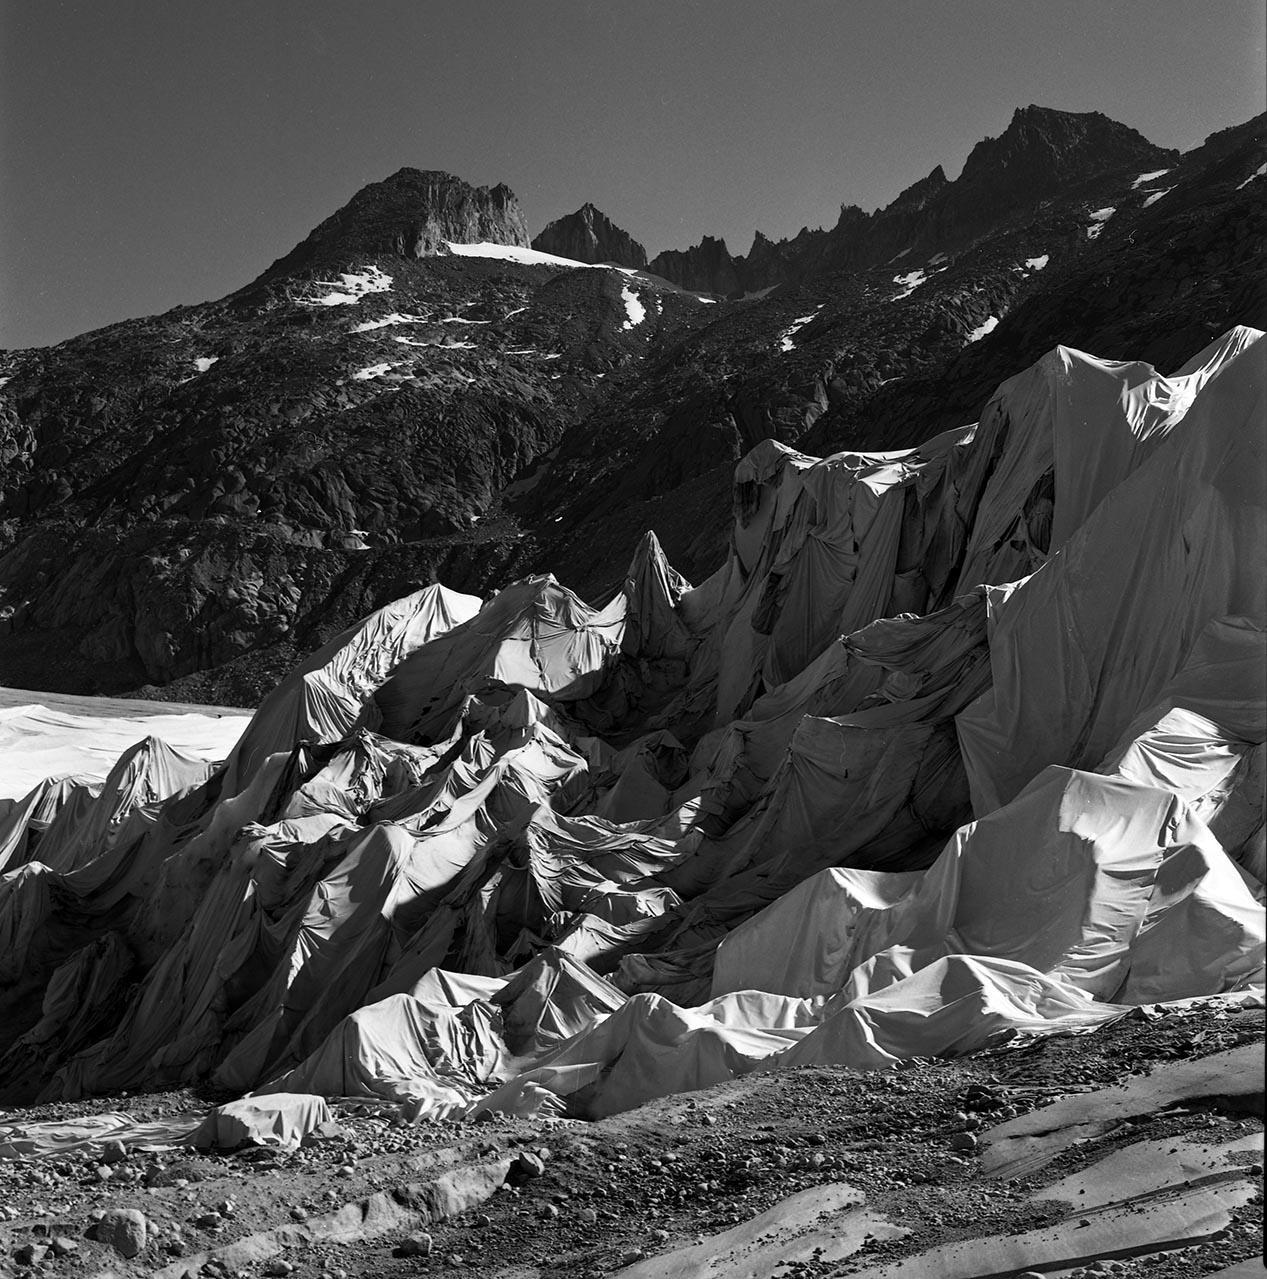 Linceul du glacier, 2019, installation insitu by Garo